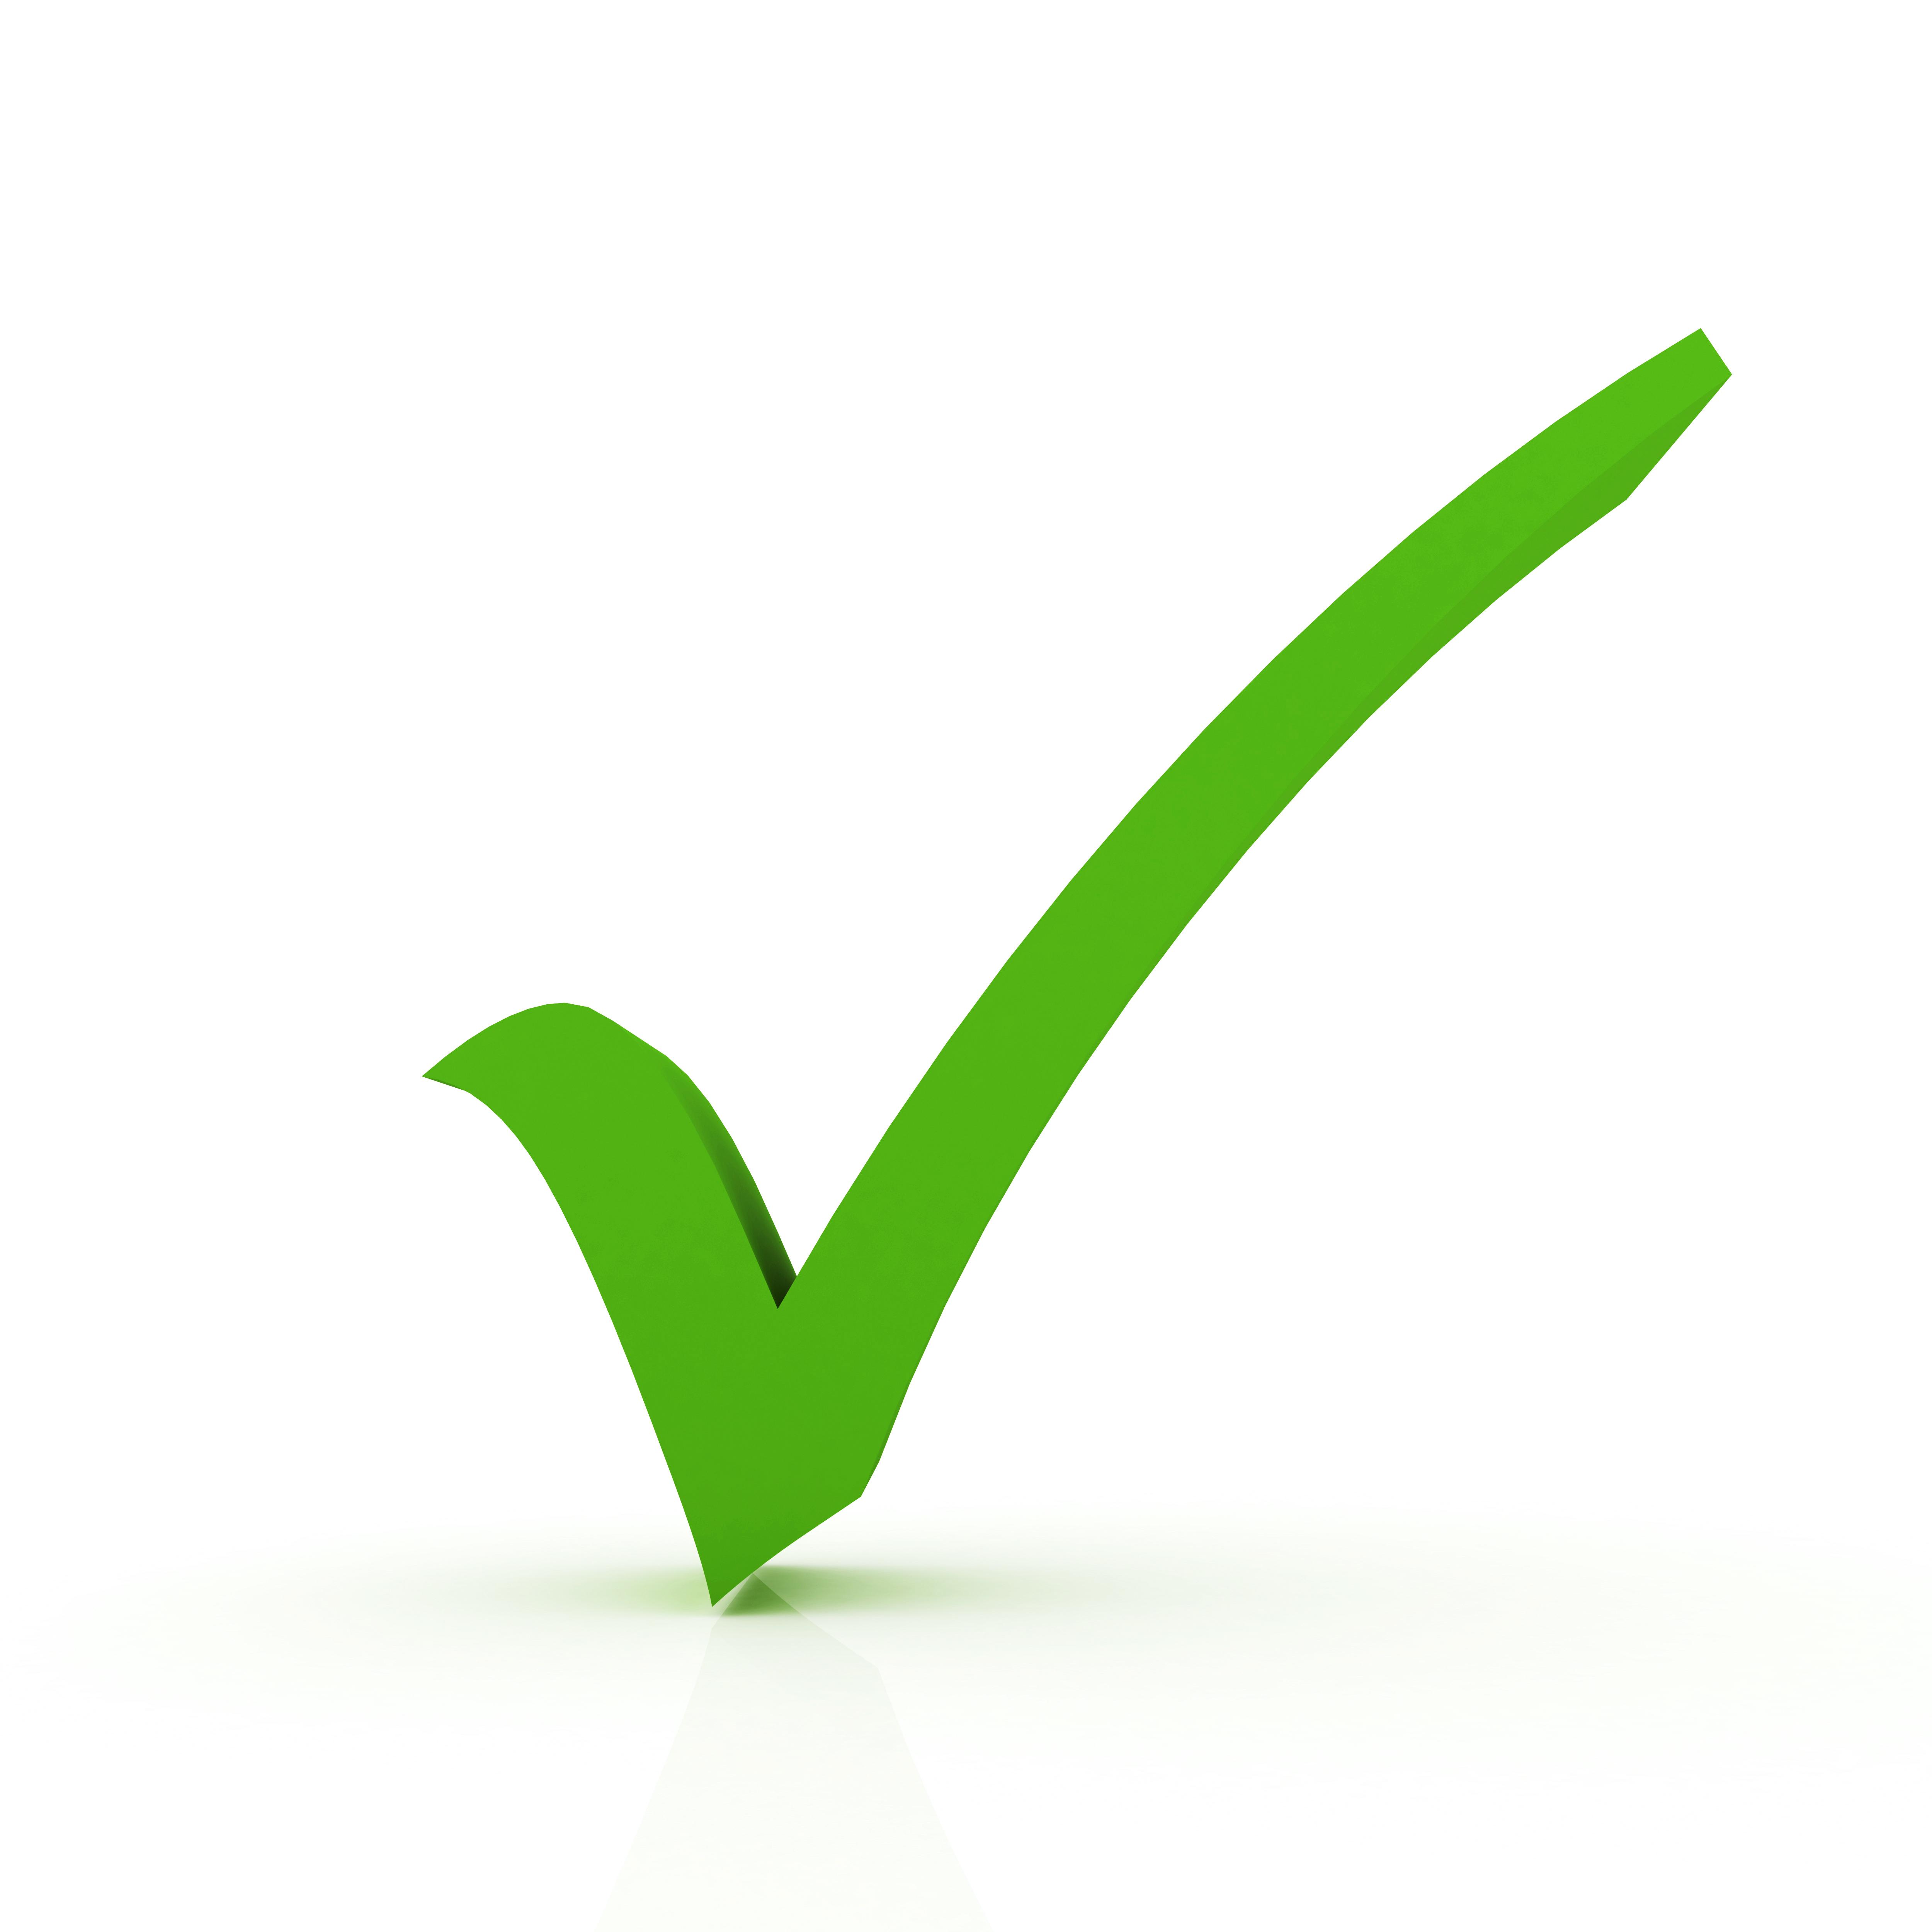 5000x5000 Green Check Mark Clip Art